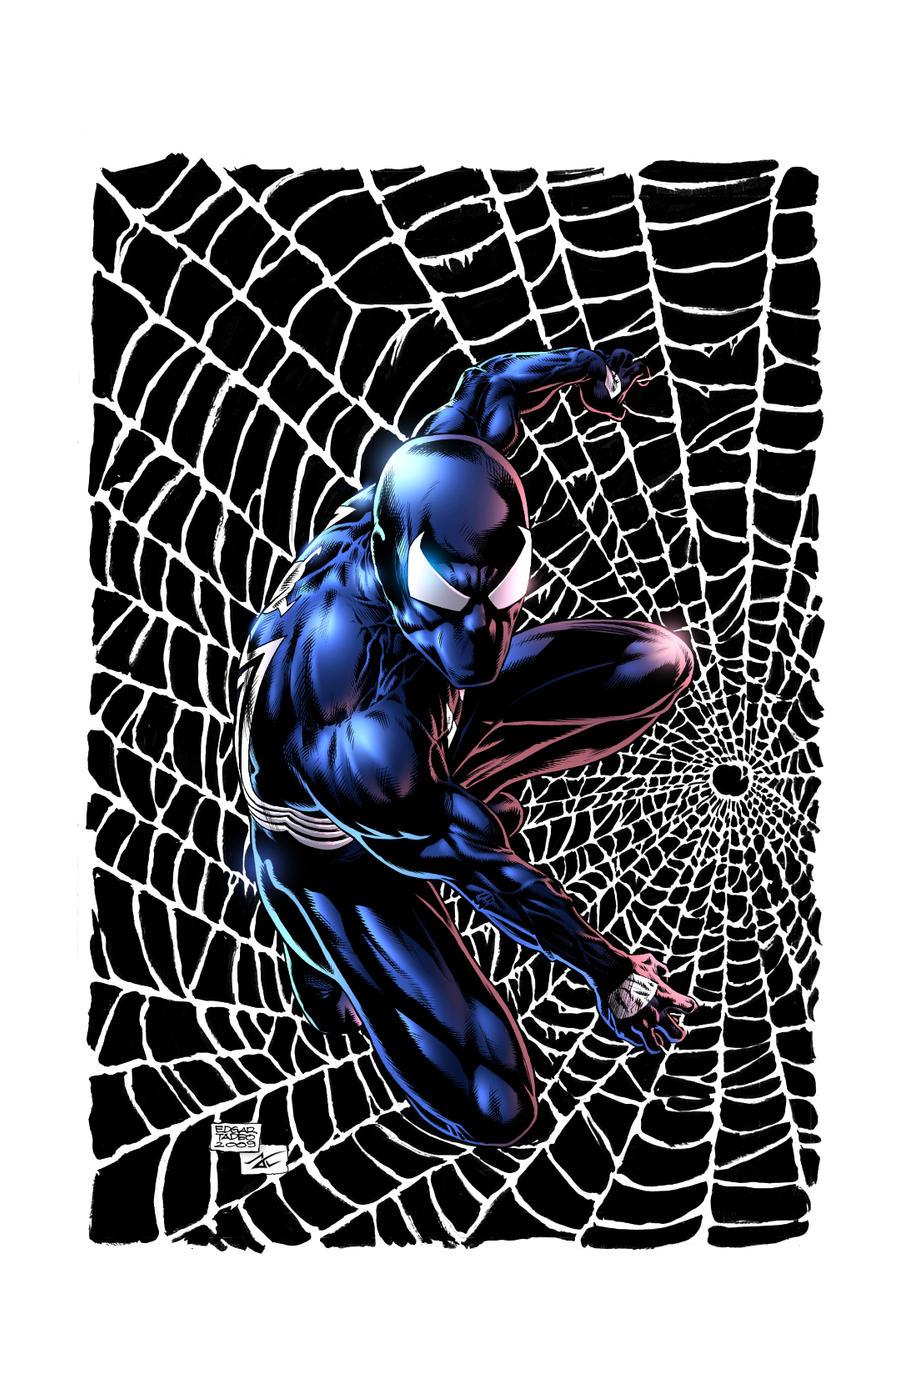 Spider-Man Black Suit! by JackLavy on DeviantArt